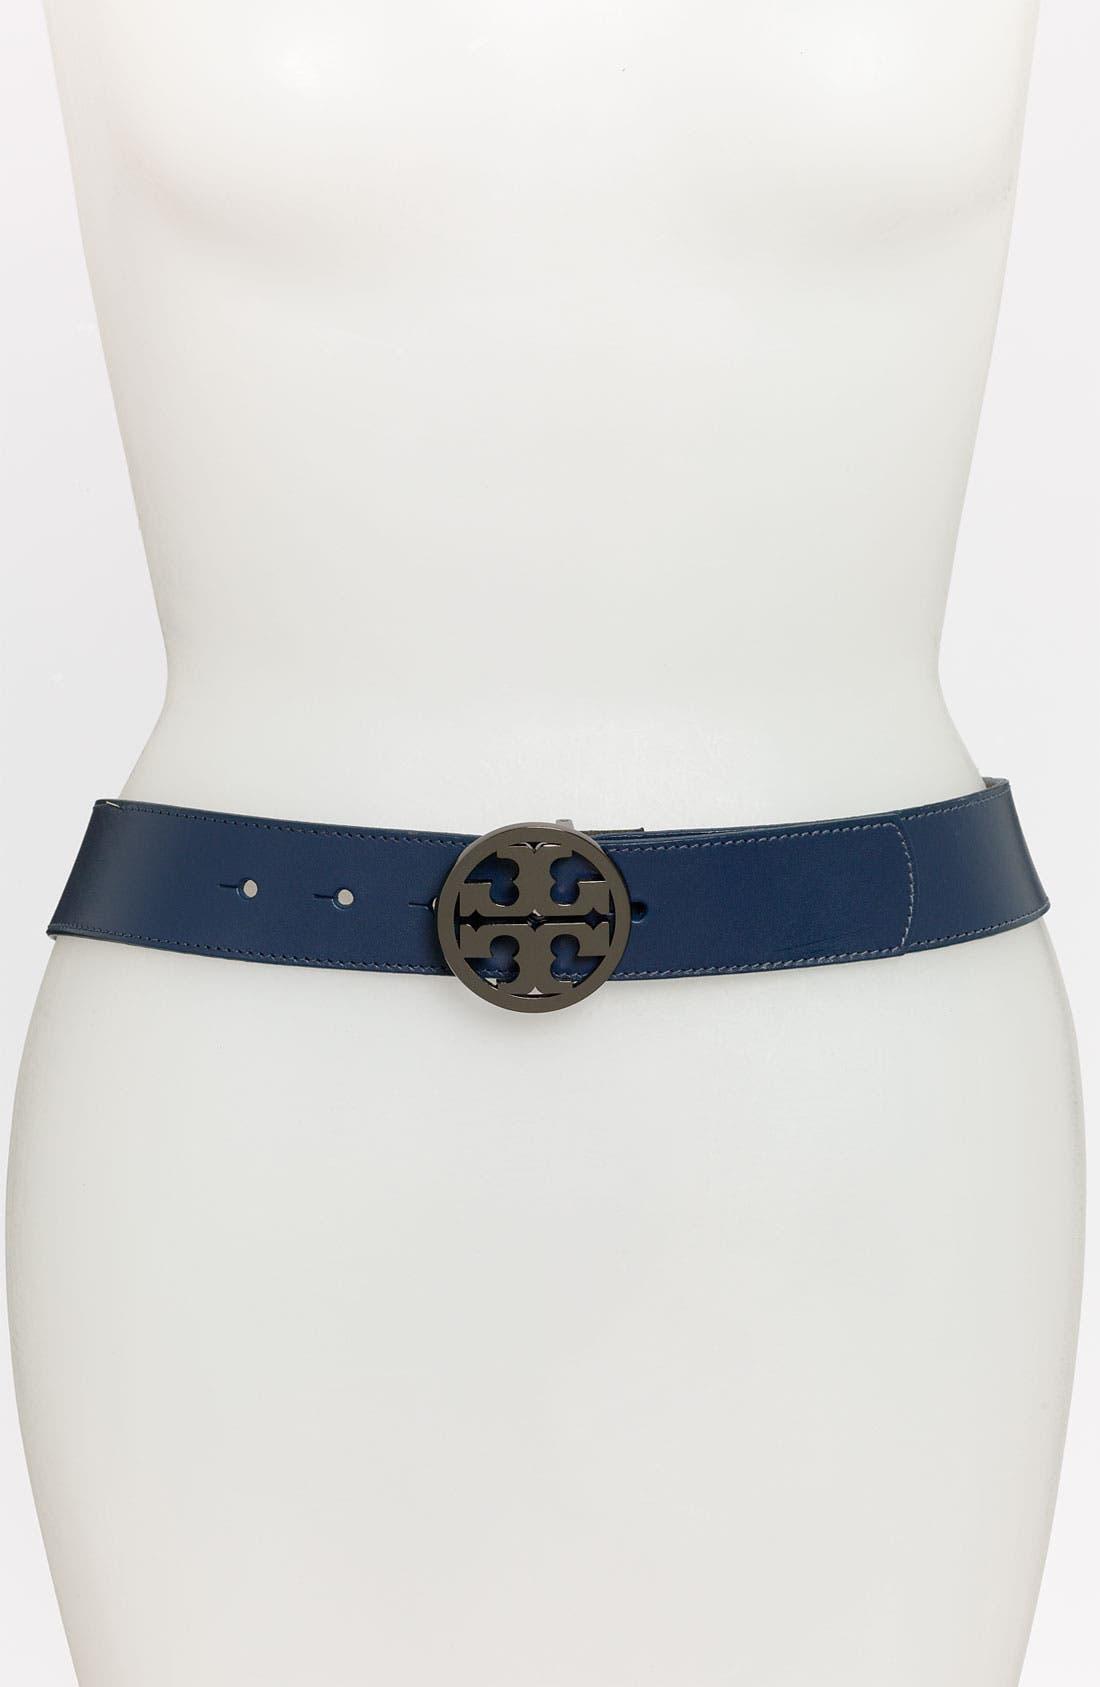 Alternate Image 1 Selected - Tory Burch 'Robinson' Logo Belt